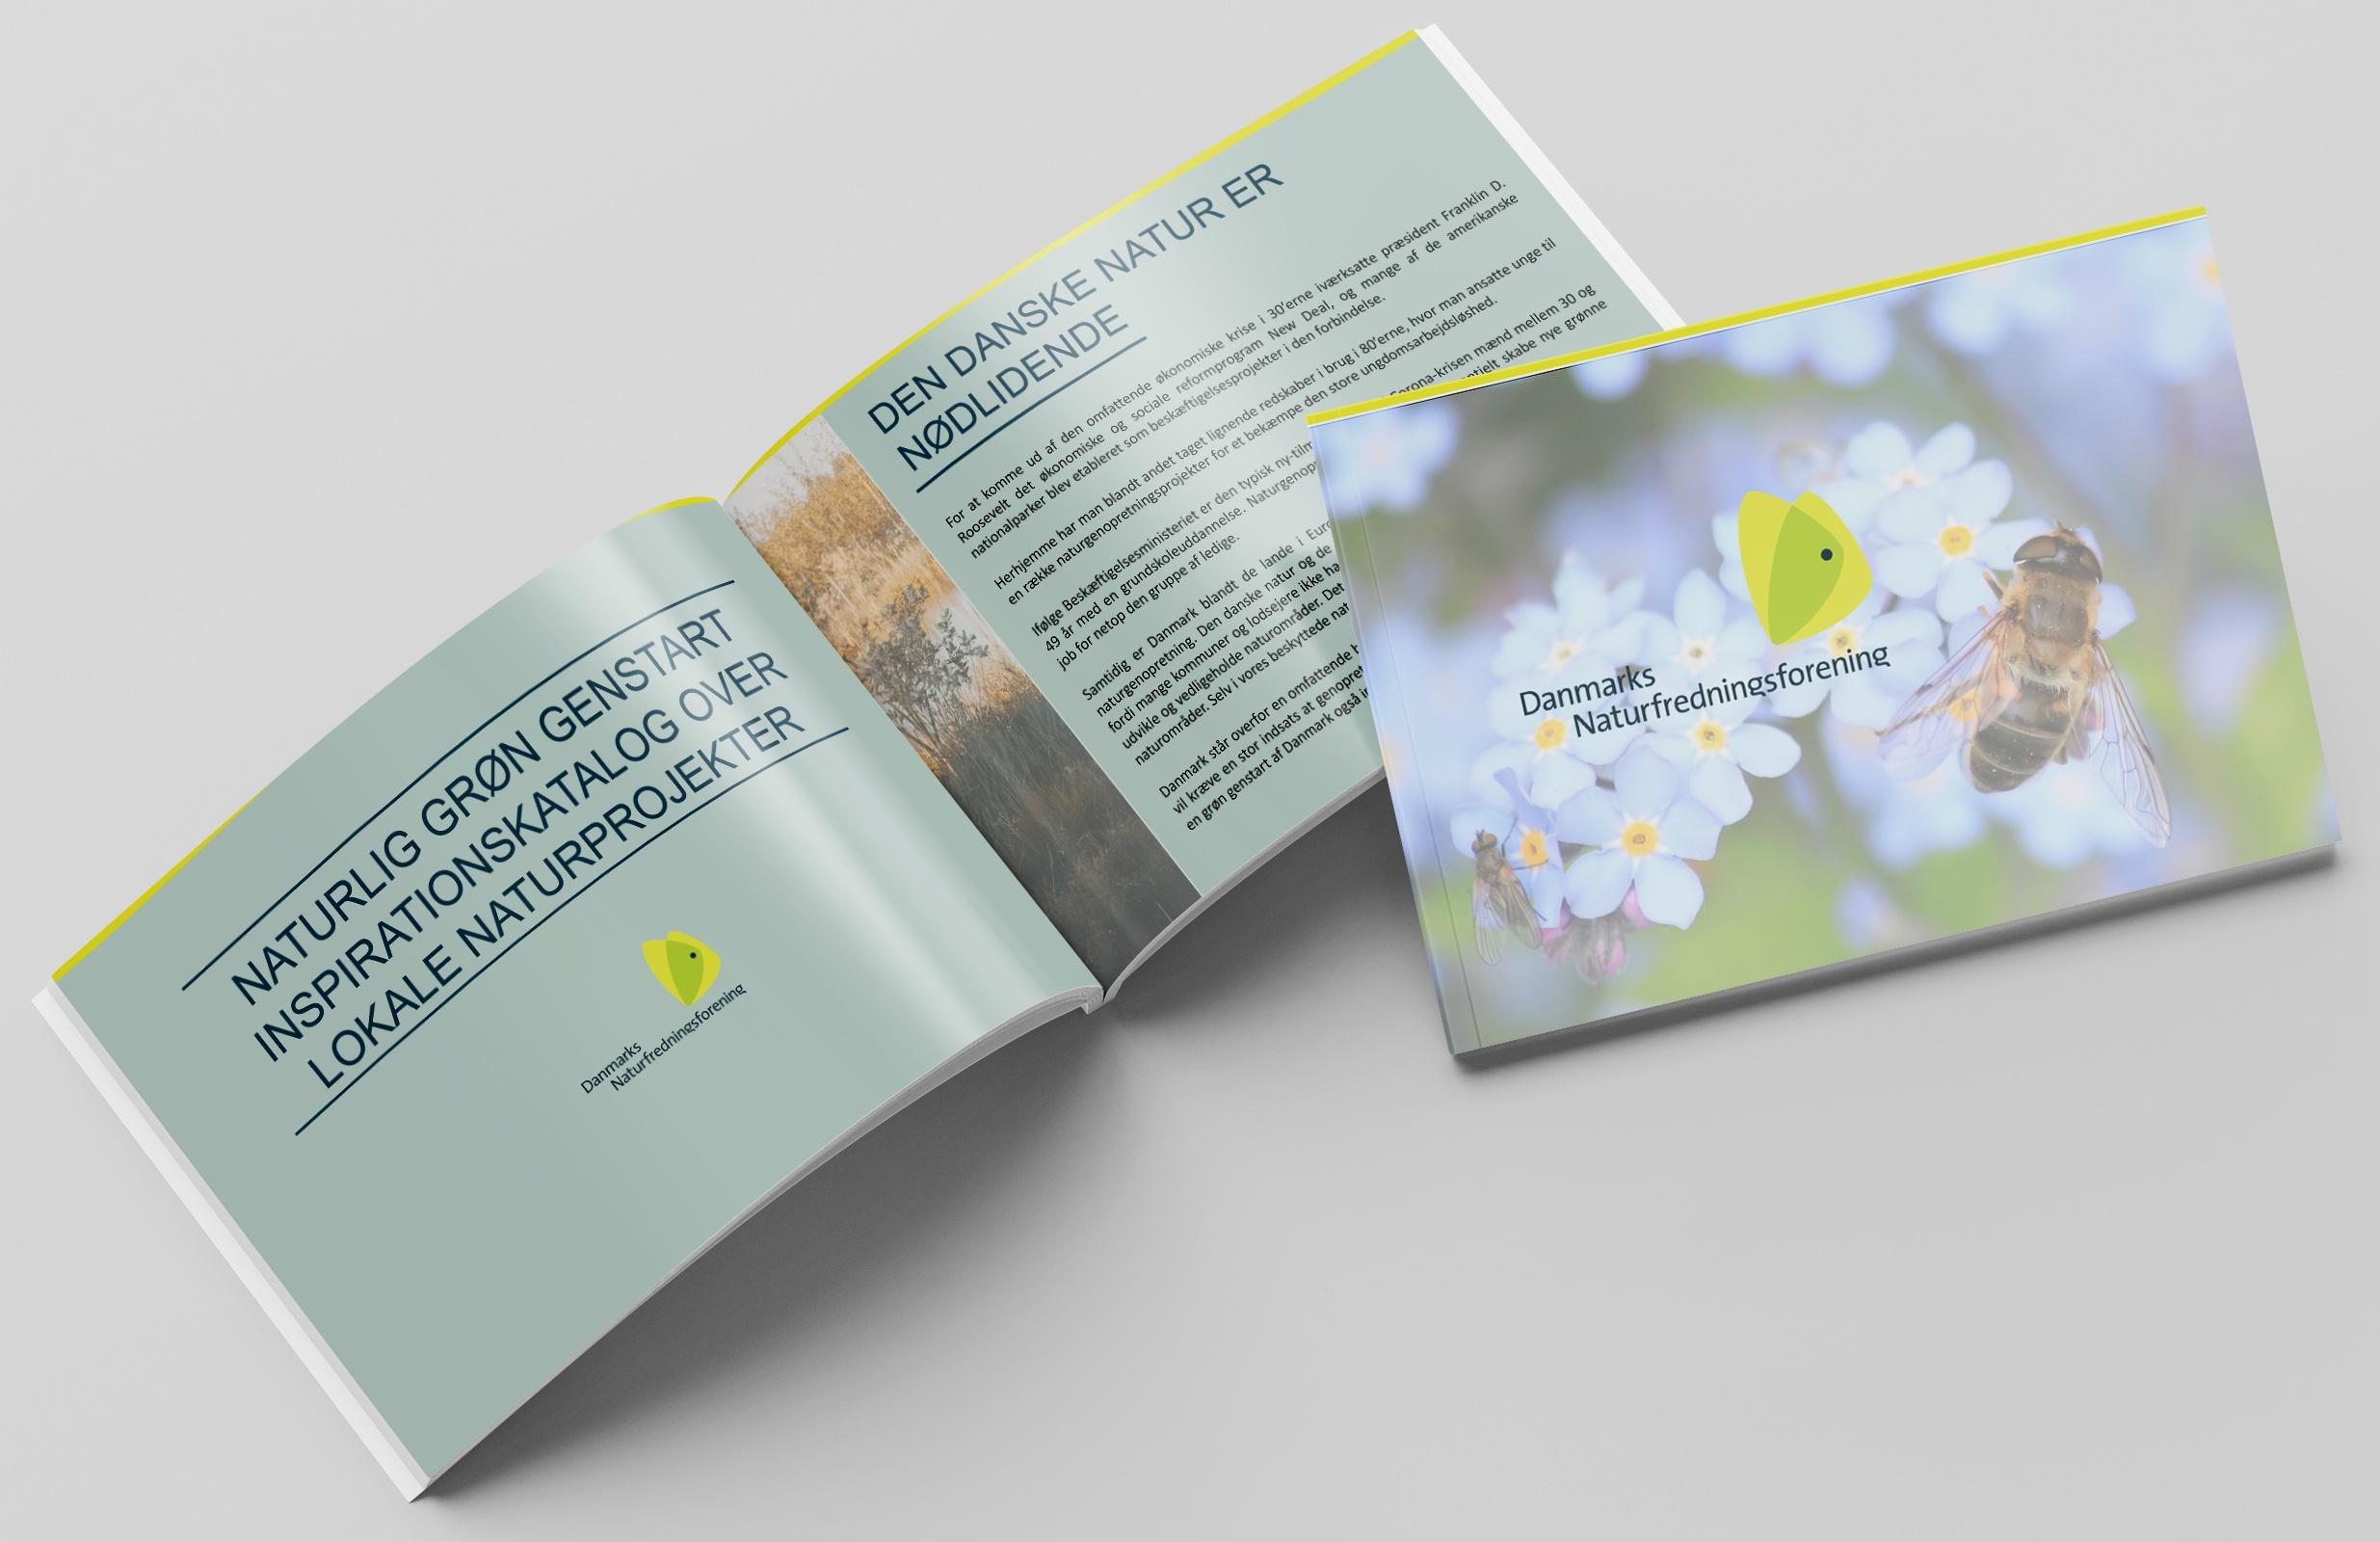 På bare én måned: Knap 300 forslag til at forbedre Danmarks natur